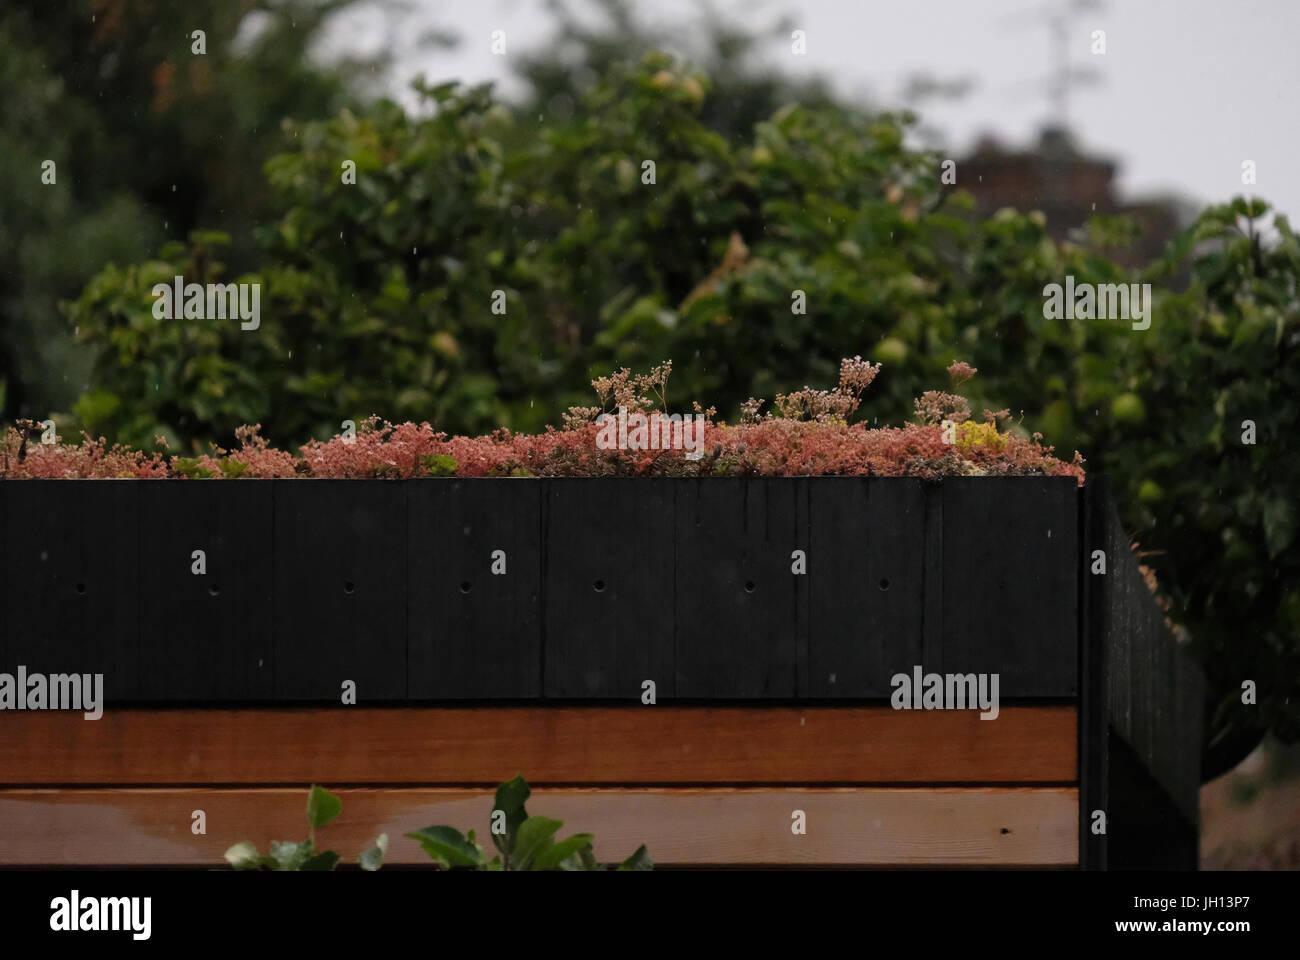 Living sedum roof - Stock Image